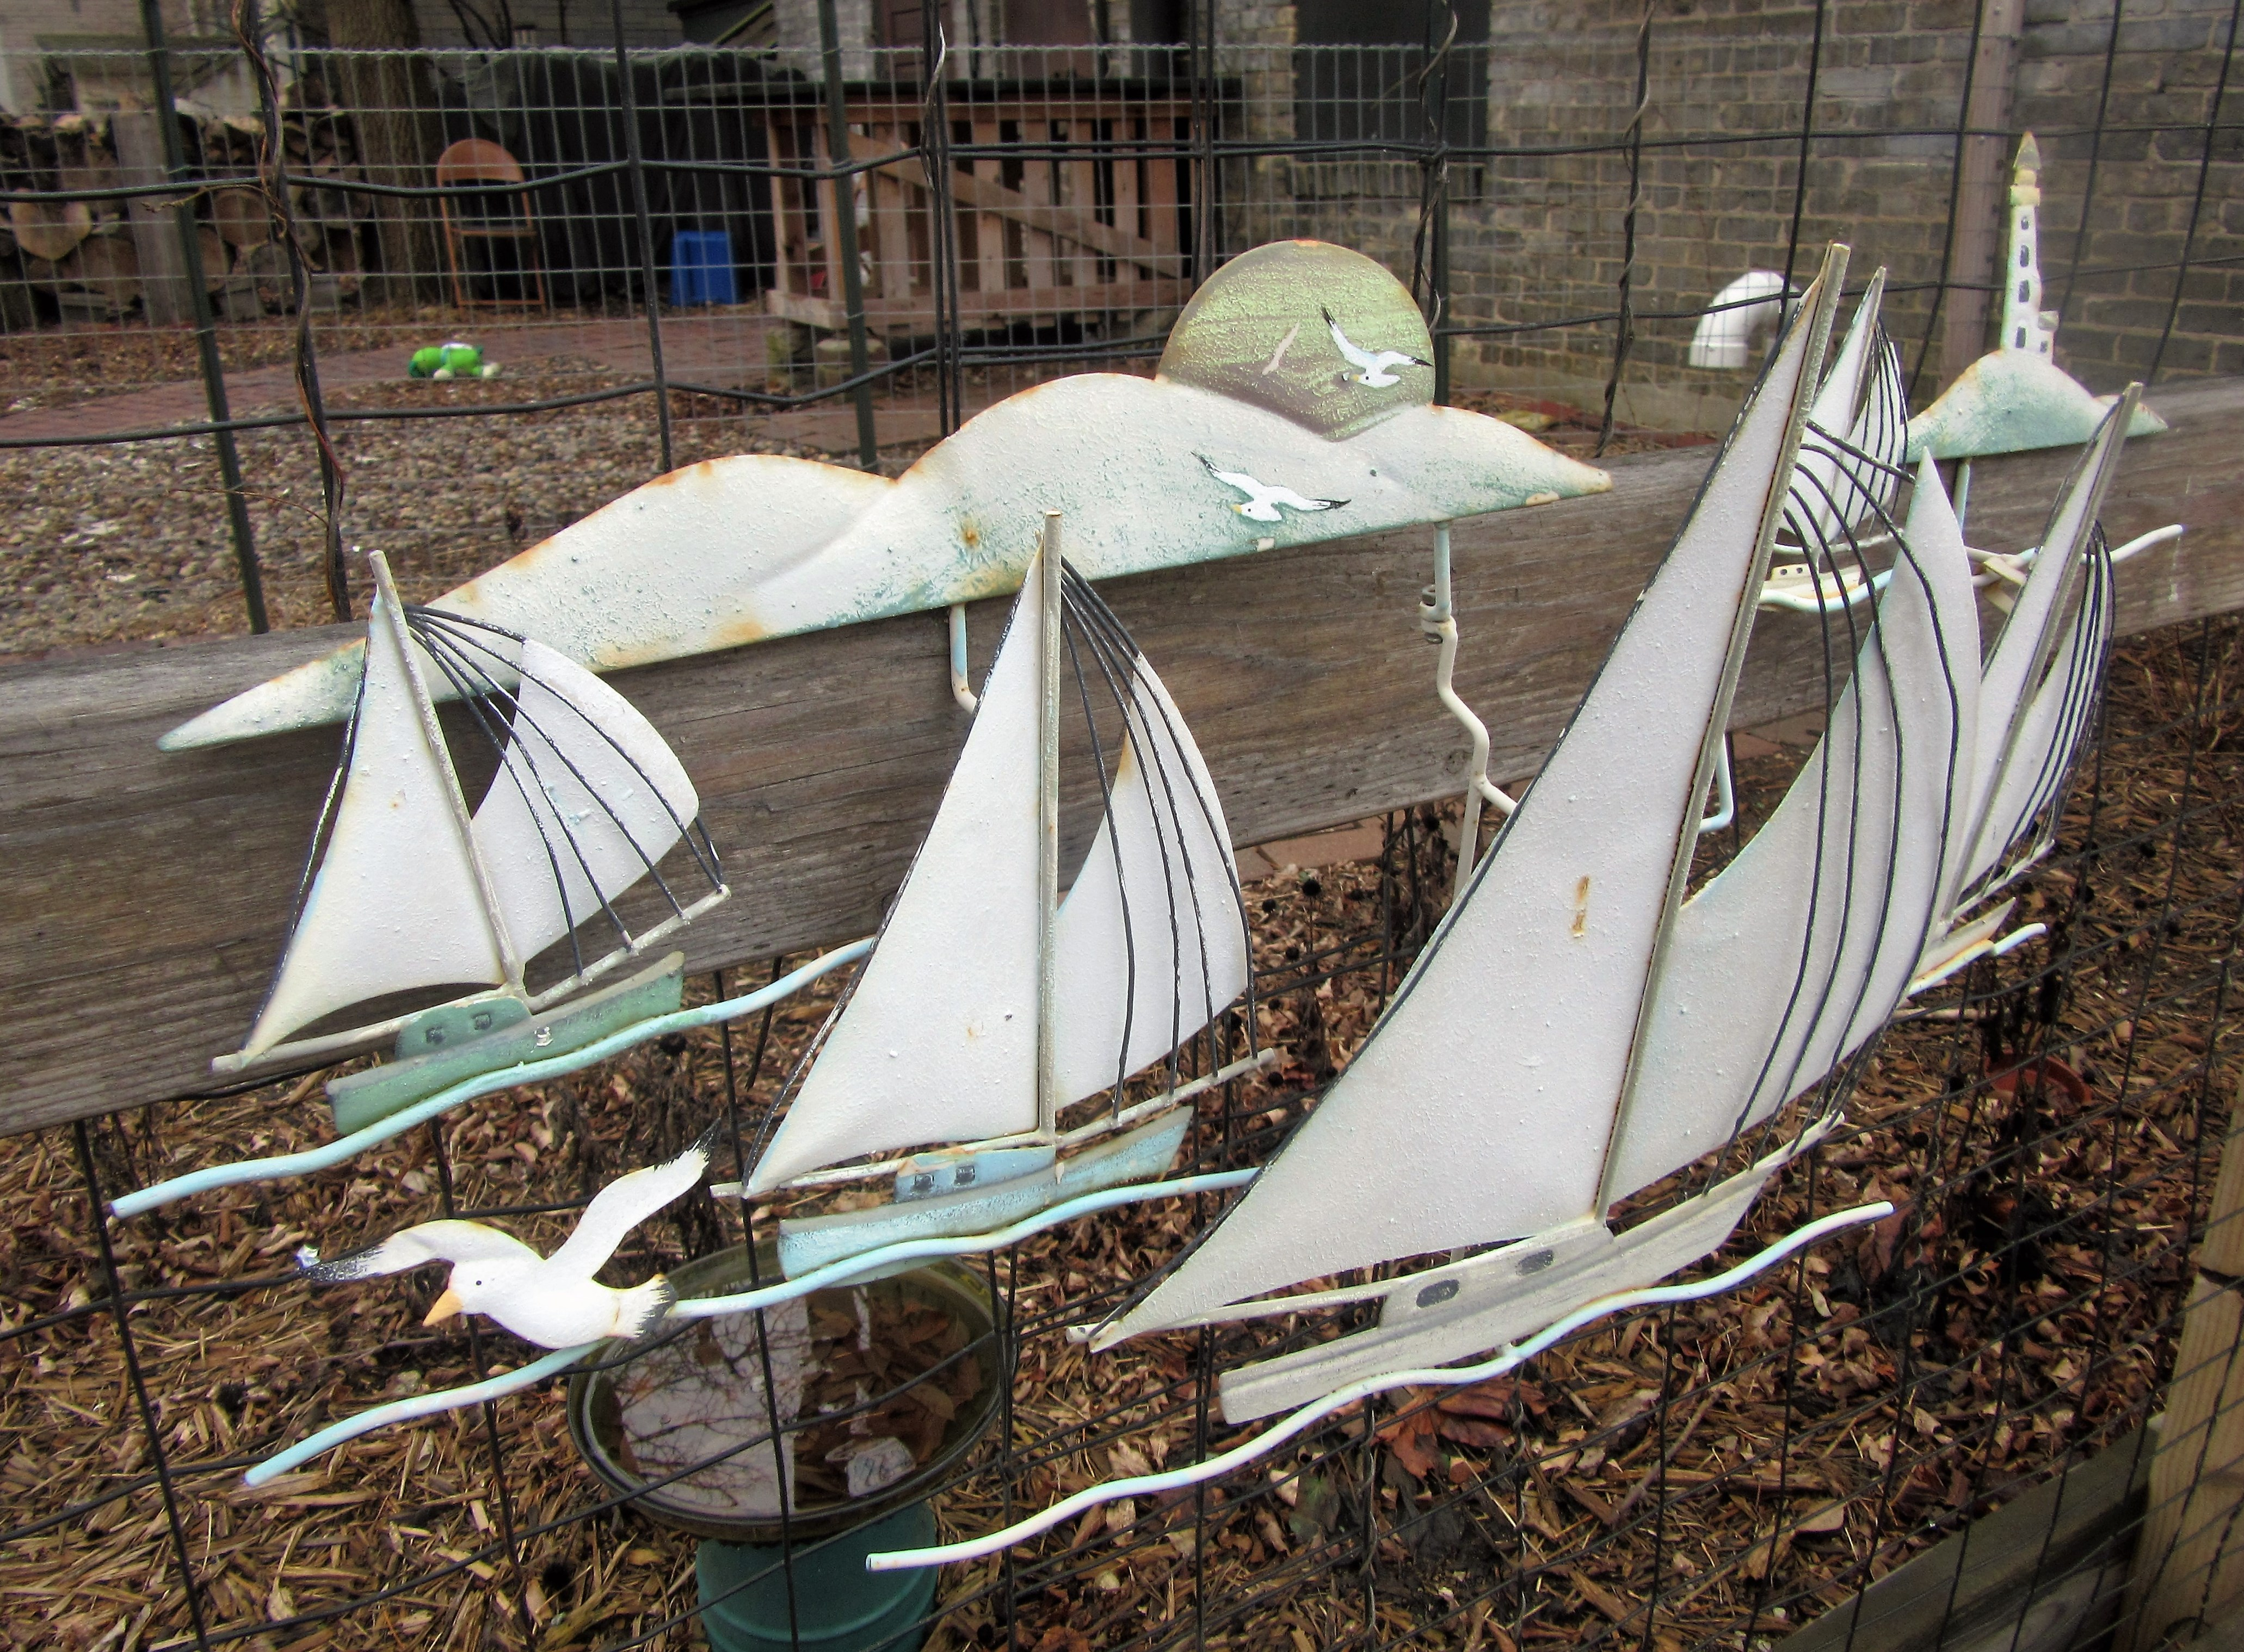 rw sailboats